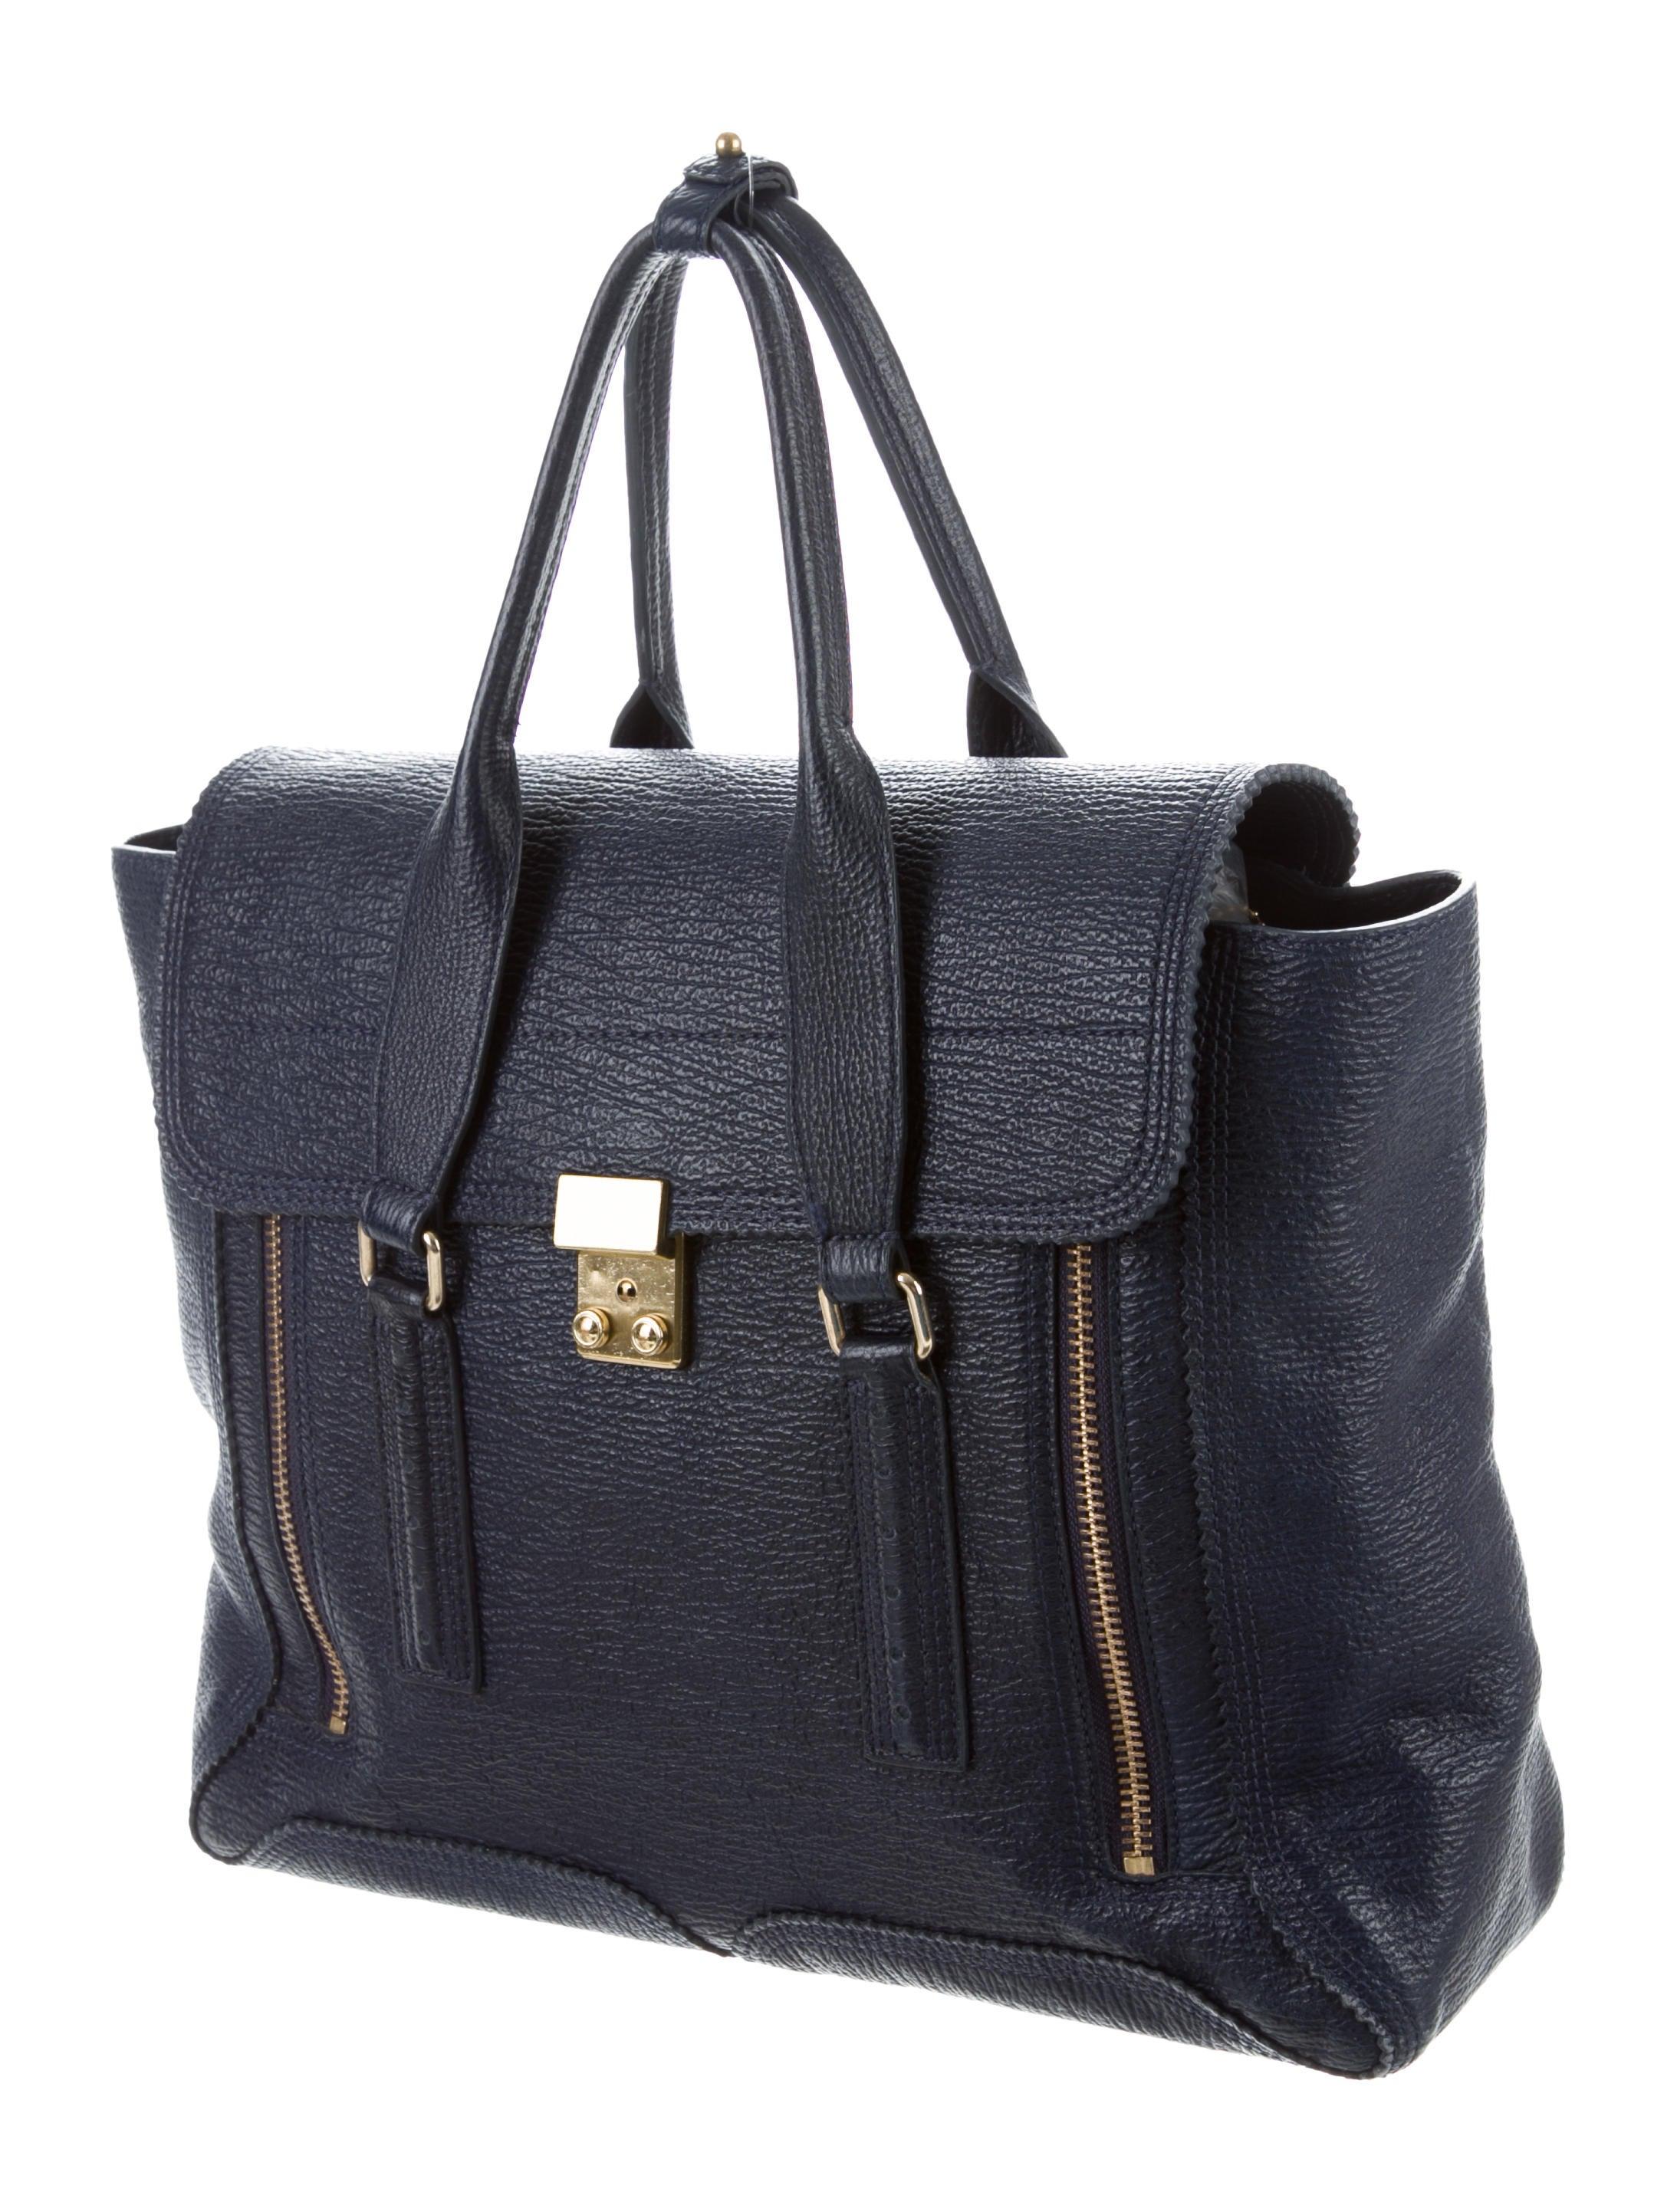 Leather Pashli Bag